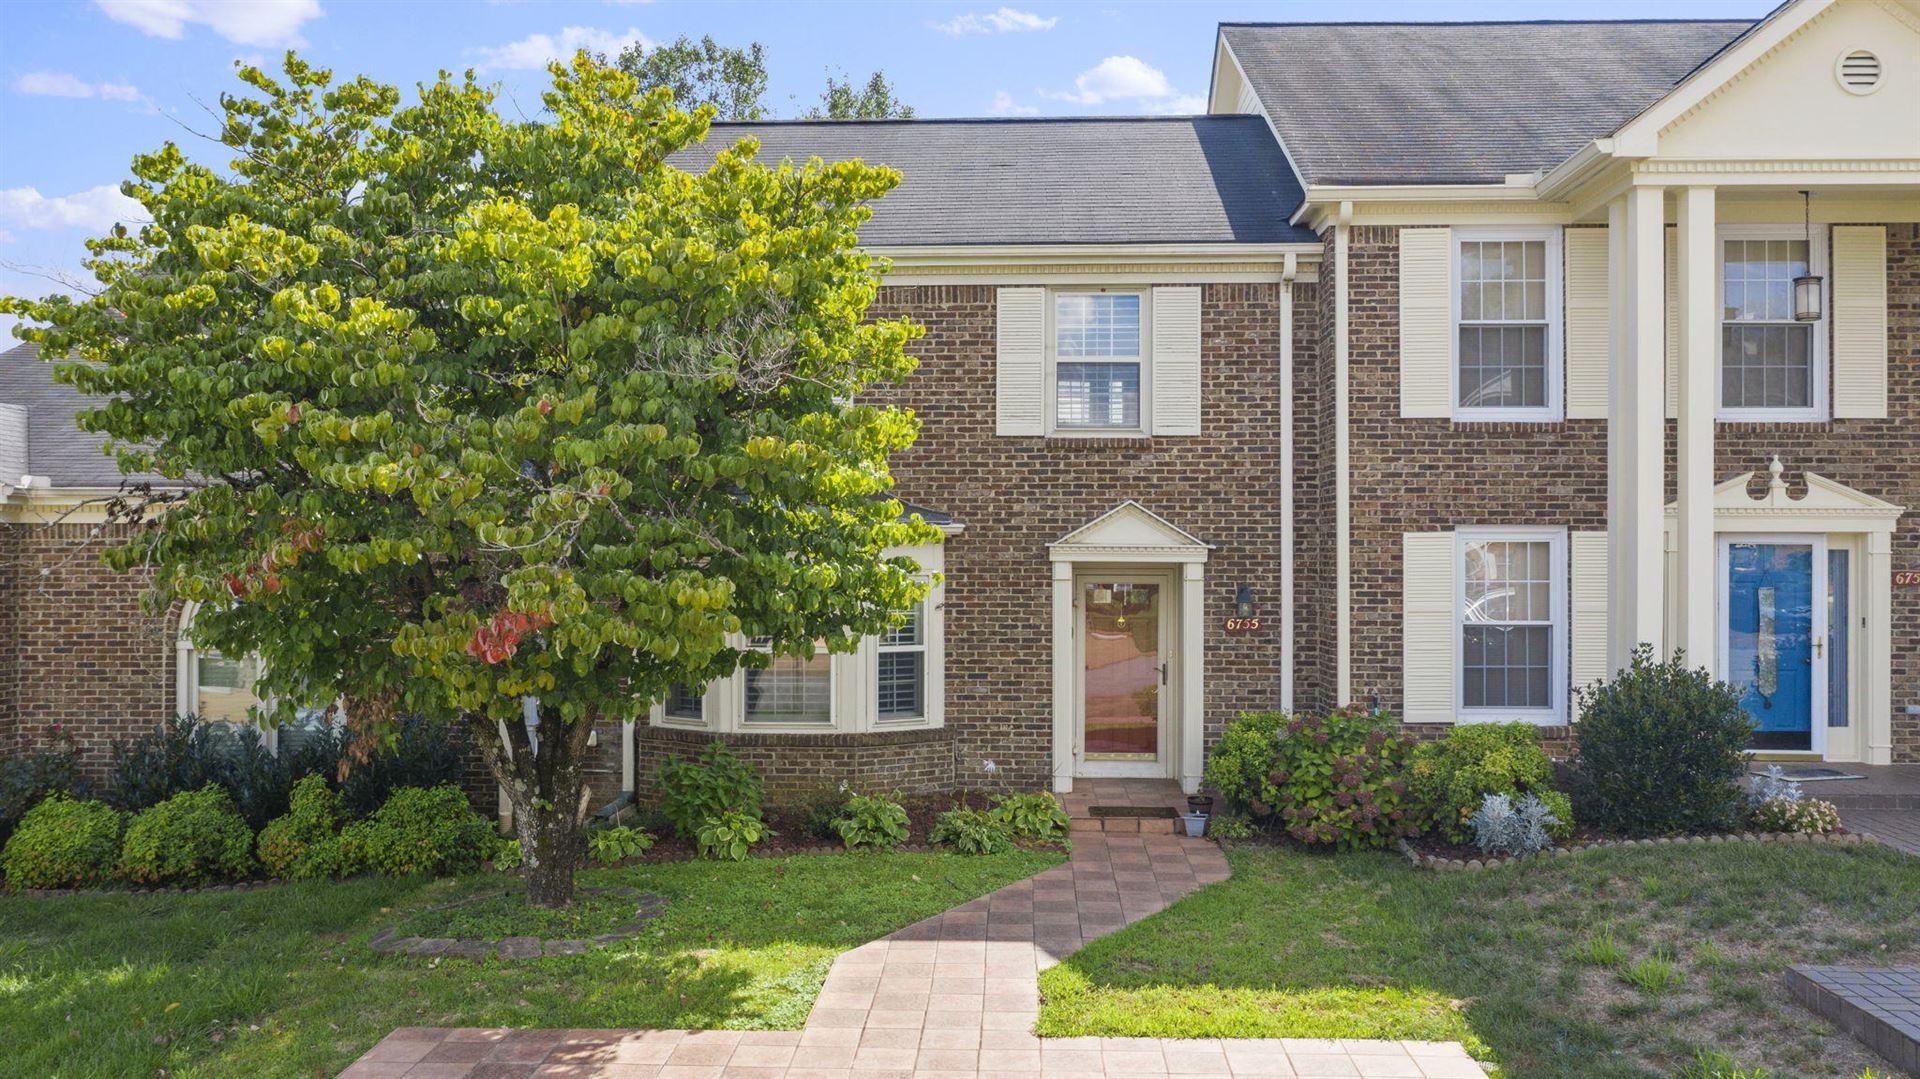 6755 Hickory Manor Cir, Chattanooga, TN 37421 - MLS#: 1324025